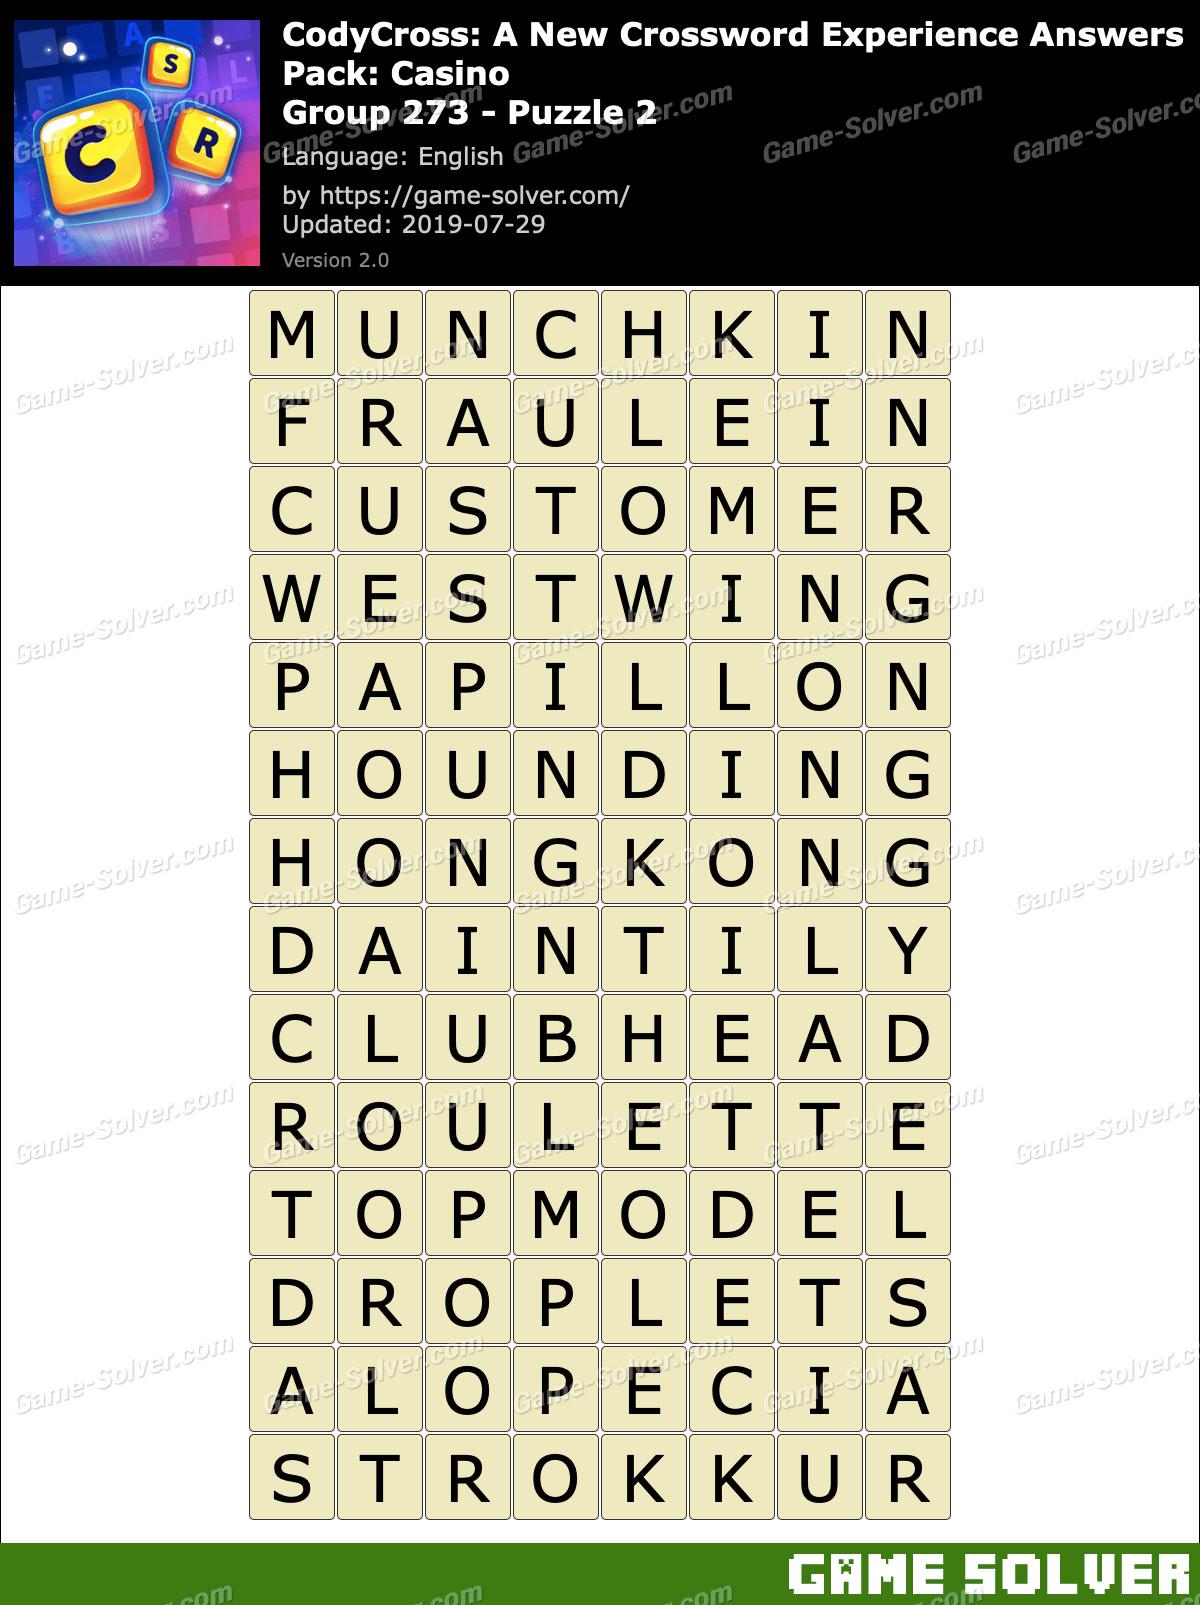 CodyCross Casino Group 273-Puzzle 2 Answers